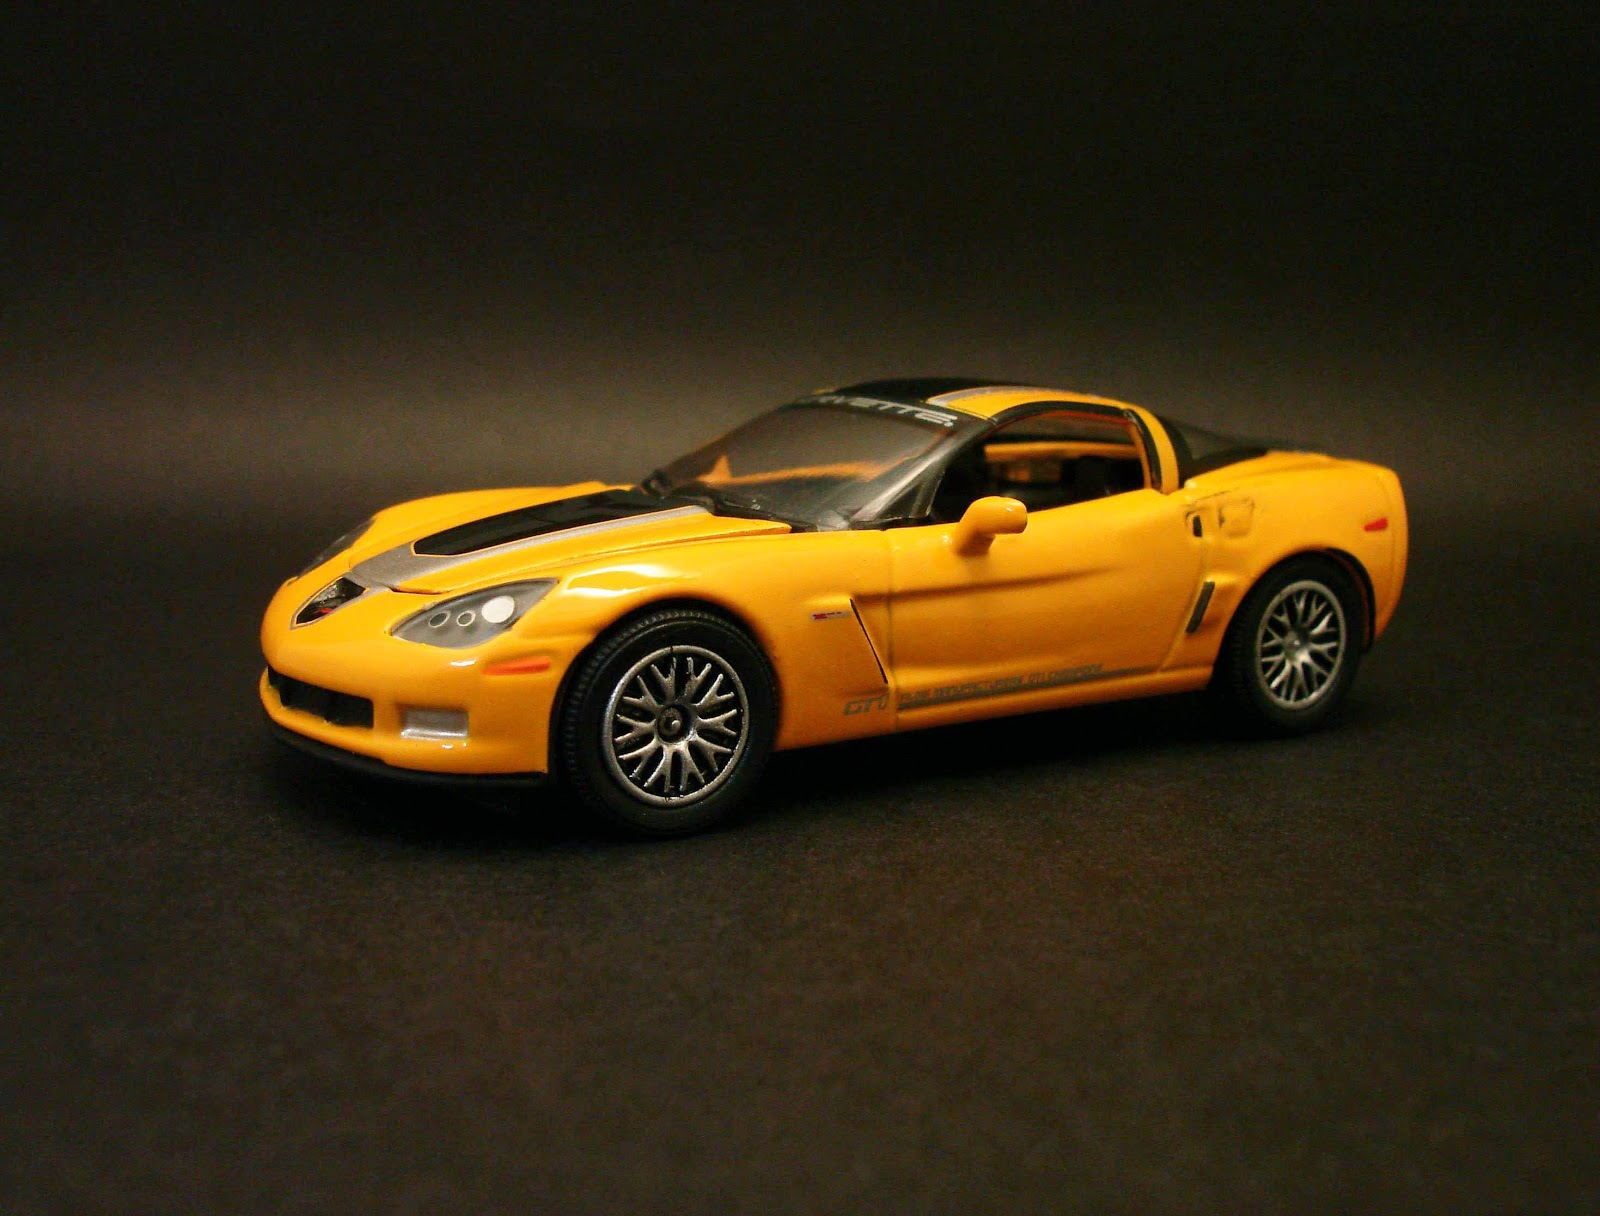 diecast hobbist 2009 chevrolet corvette z06 gt1 championship edition. Black Bedroom Furniture Sets. Home Design Ideas